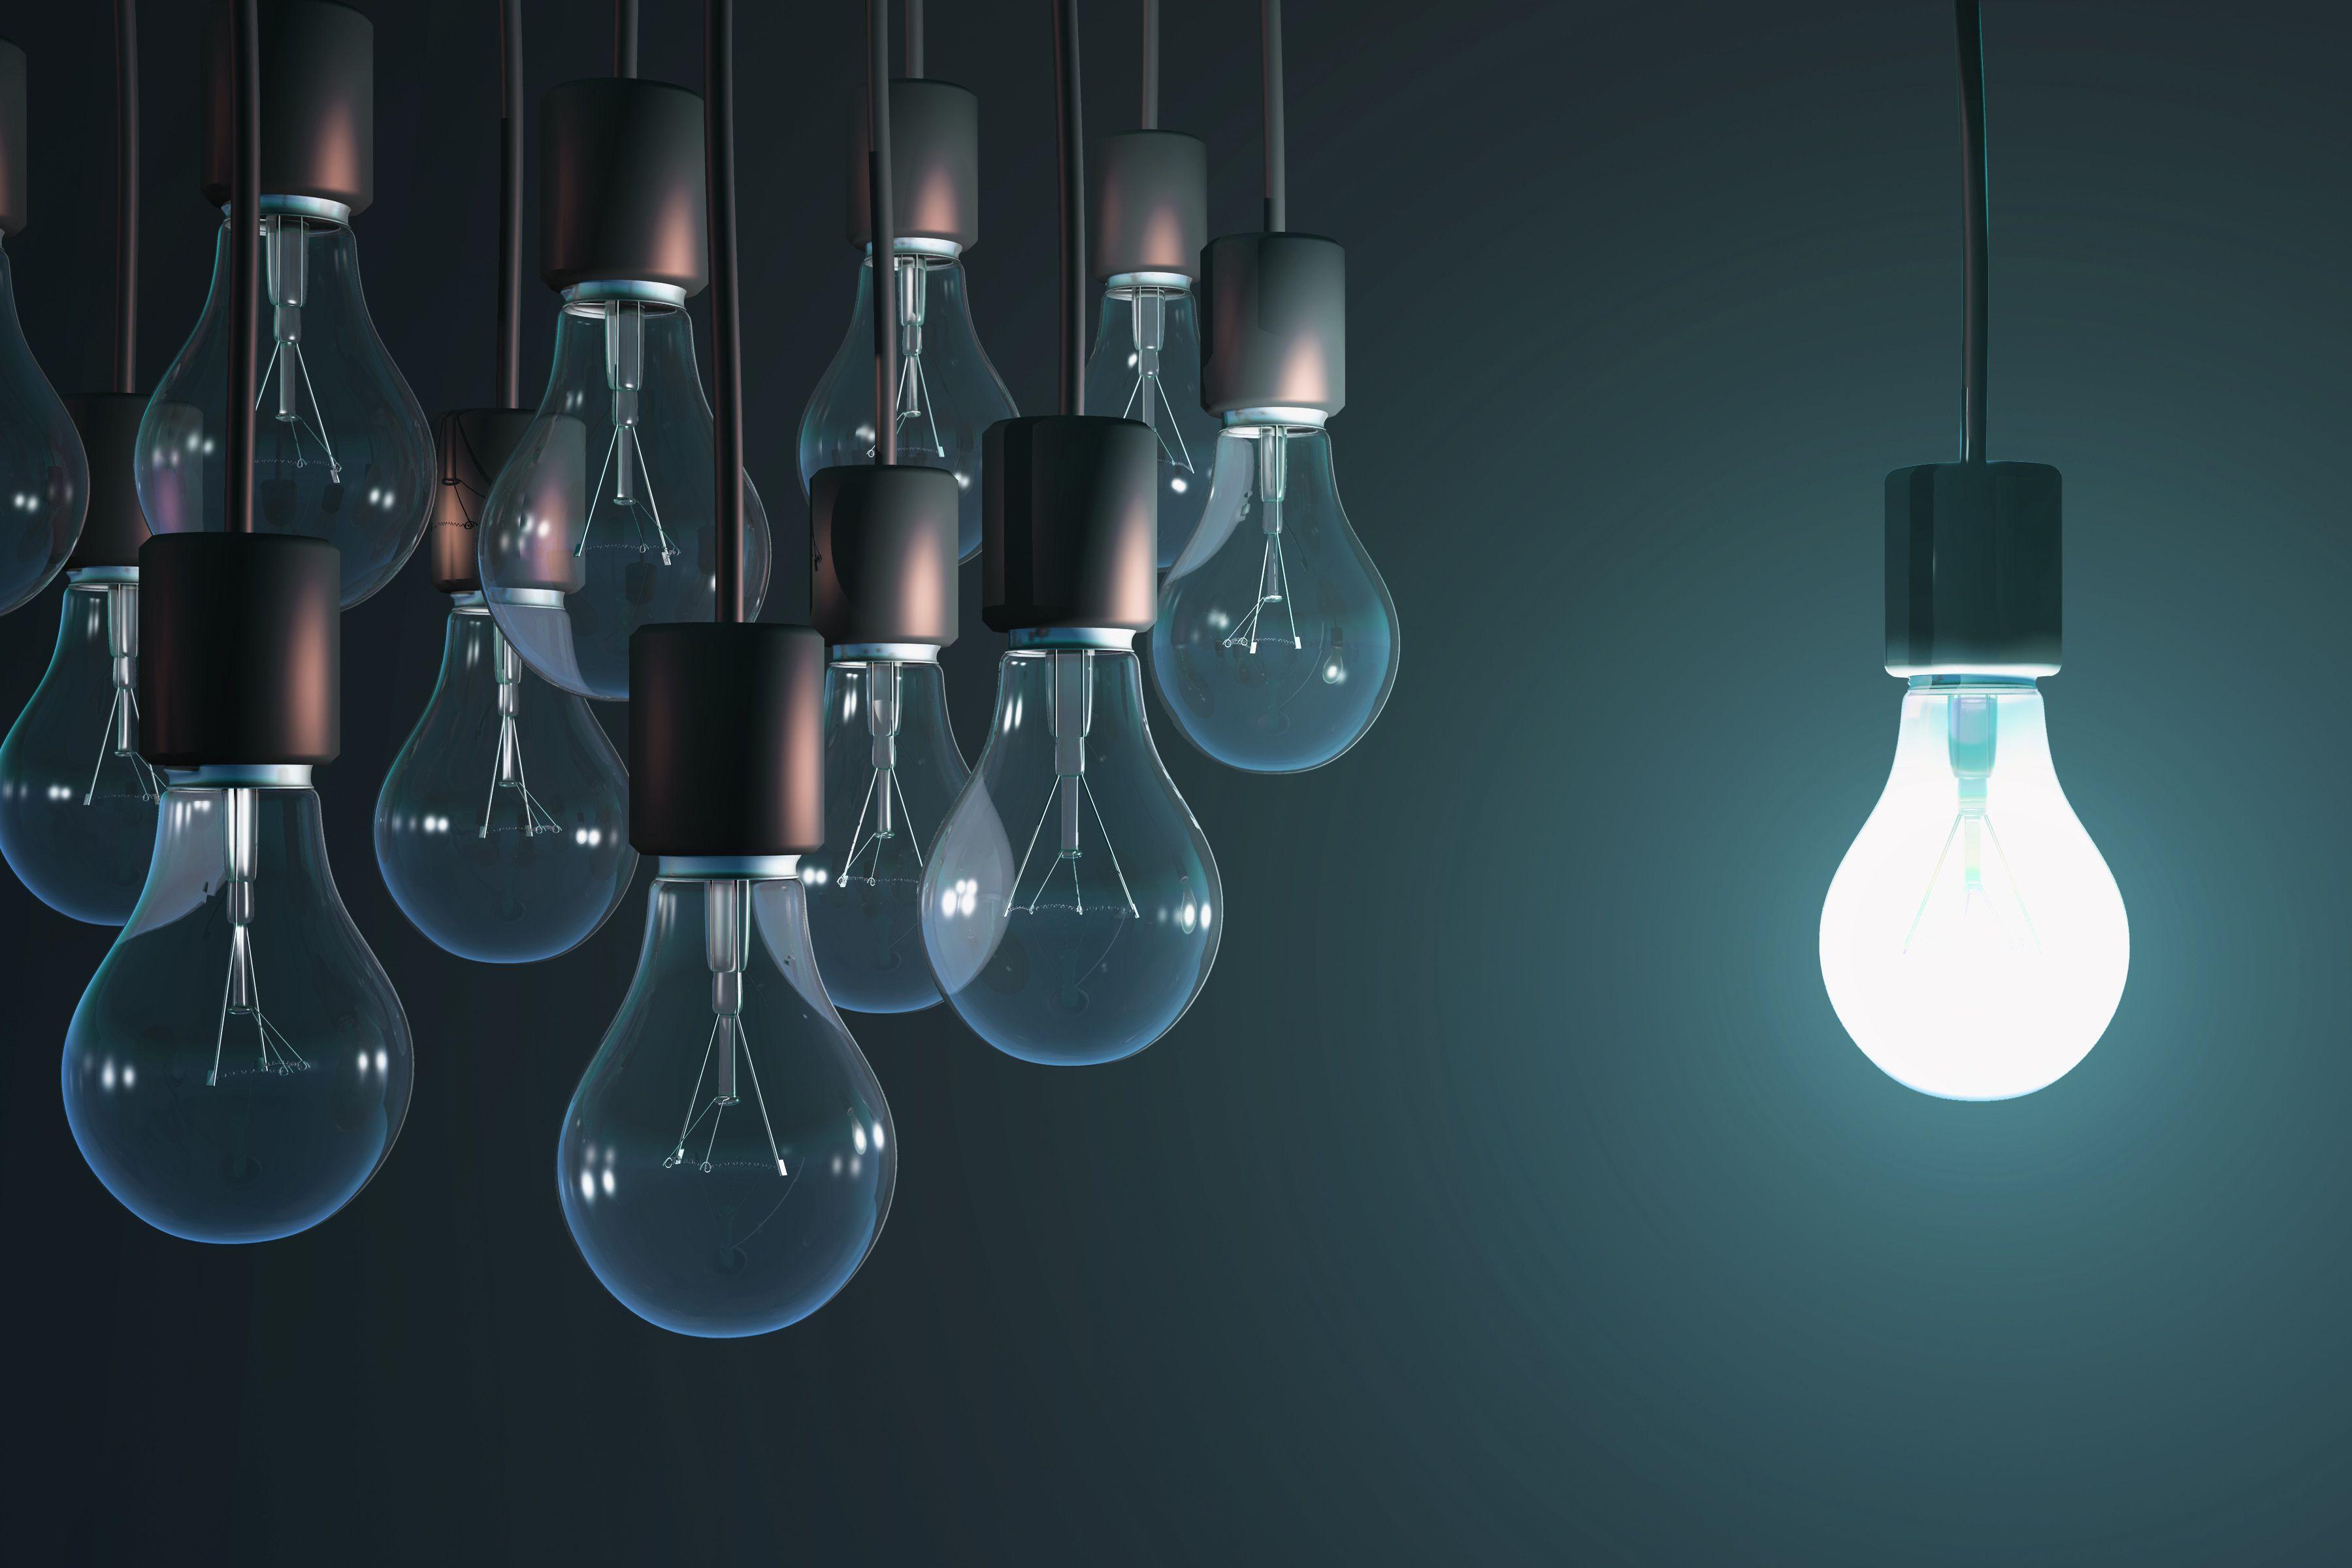 A lit bulb hanging near a group of unlit bulbs.